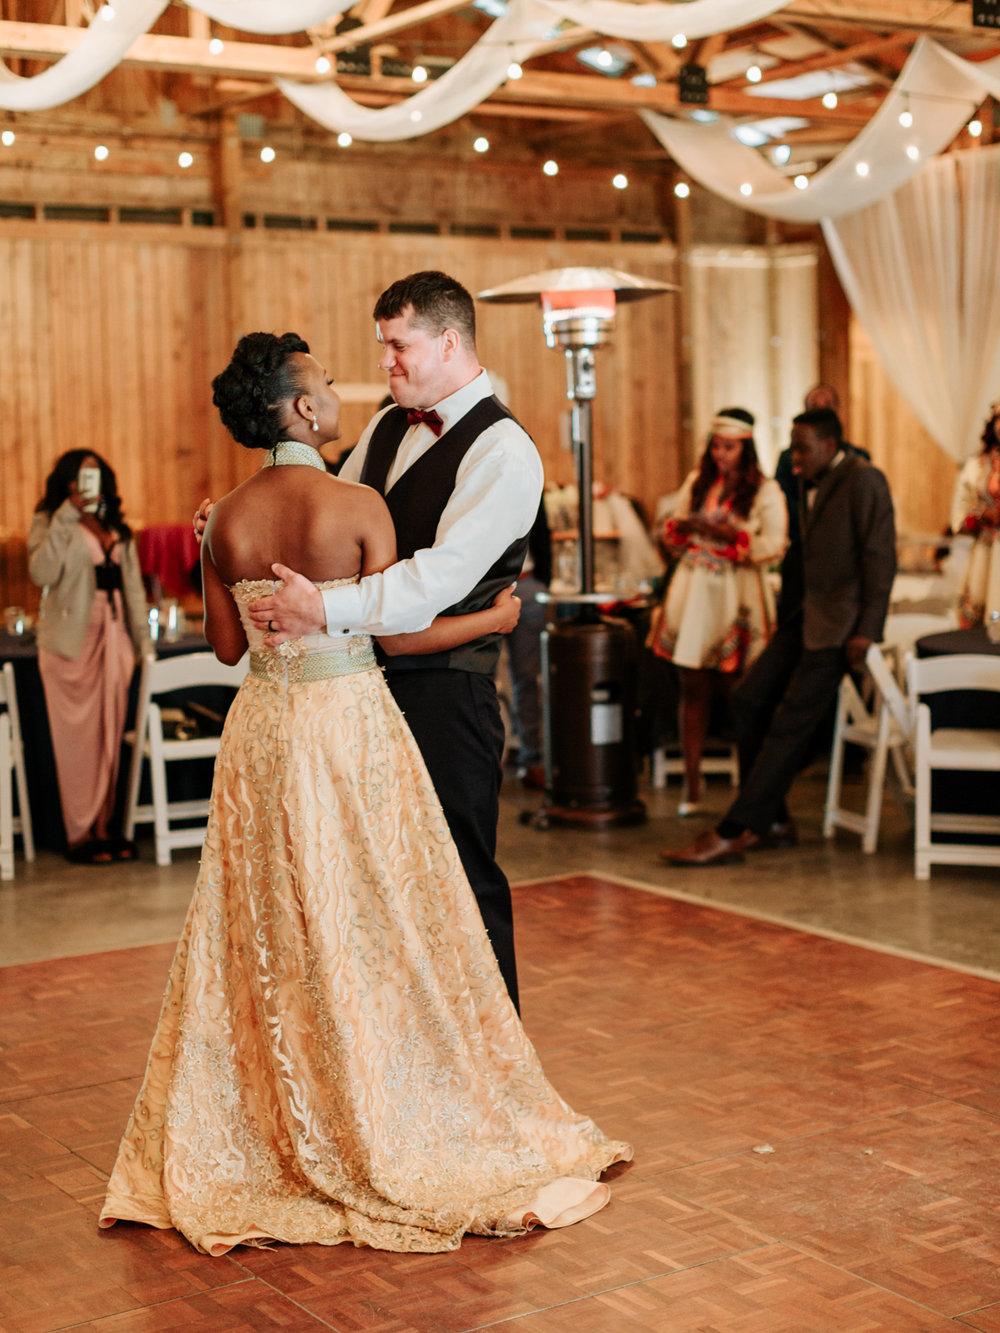 Stolen Glimpses Seattle Wedding Photographer at Rein Fire Ranch 76.jpg